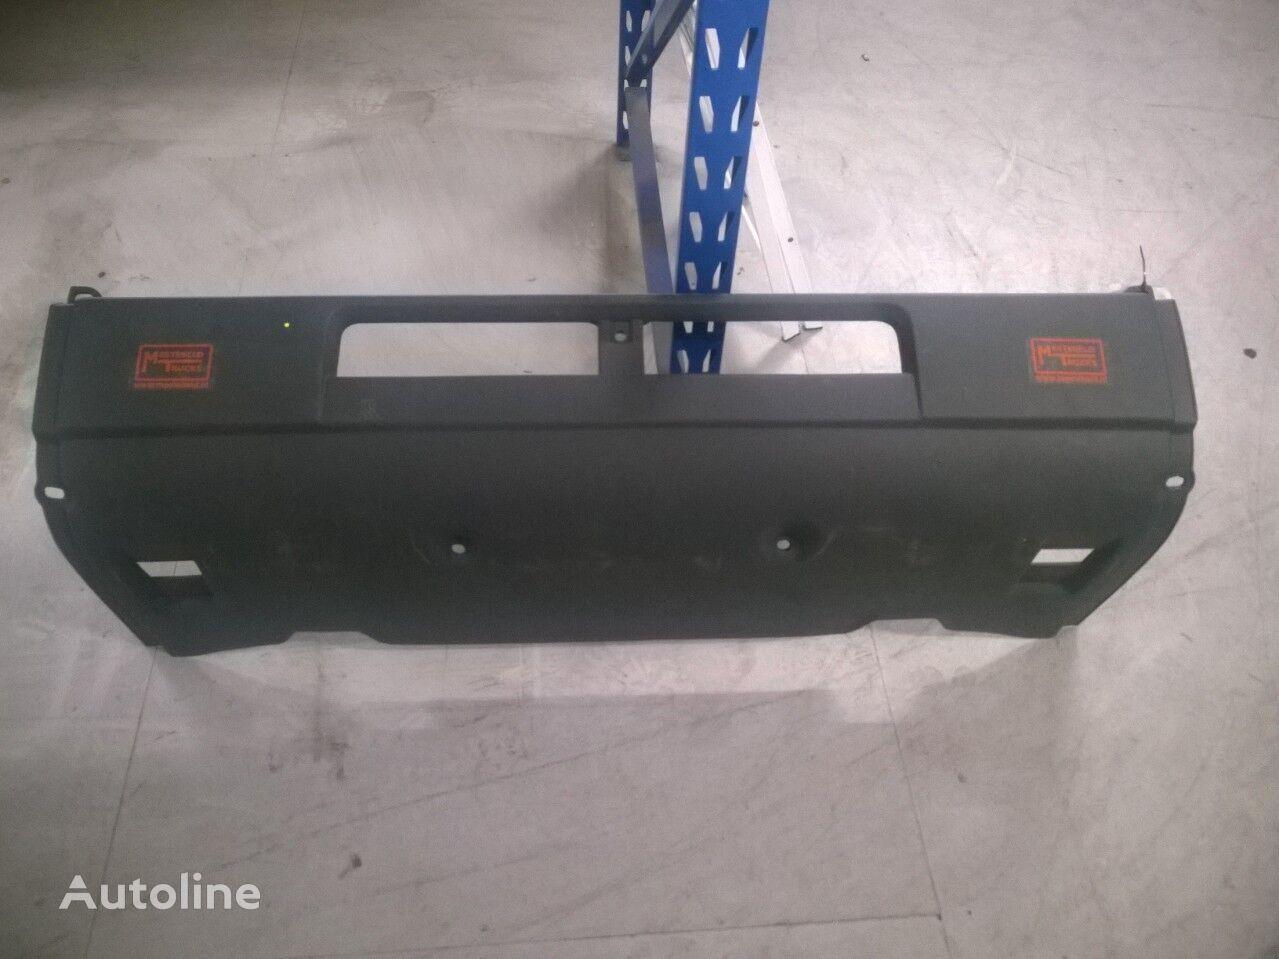 новый бампер  Bumperdeel midden для грузовика SCANIA Bumperdeel midden